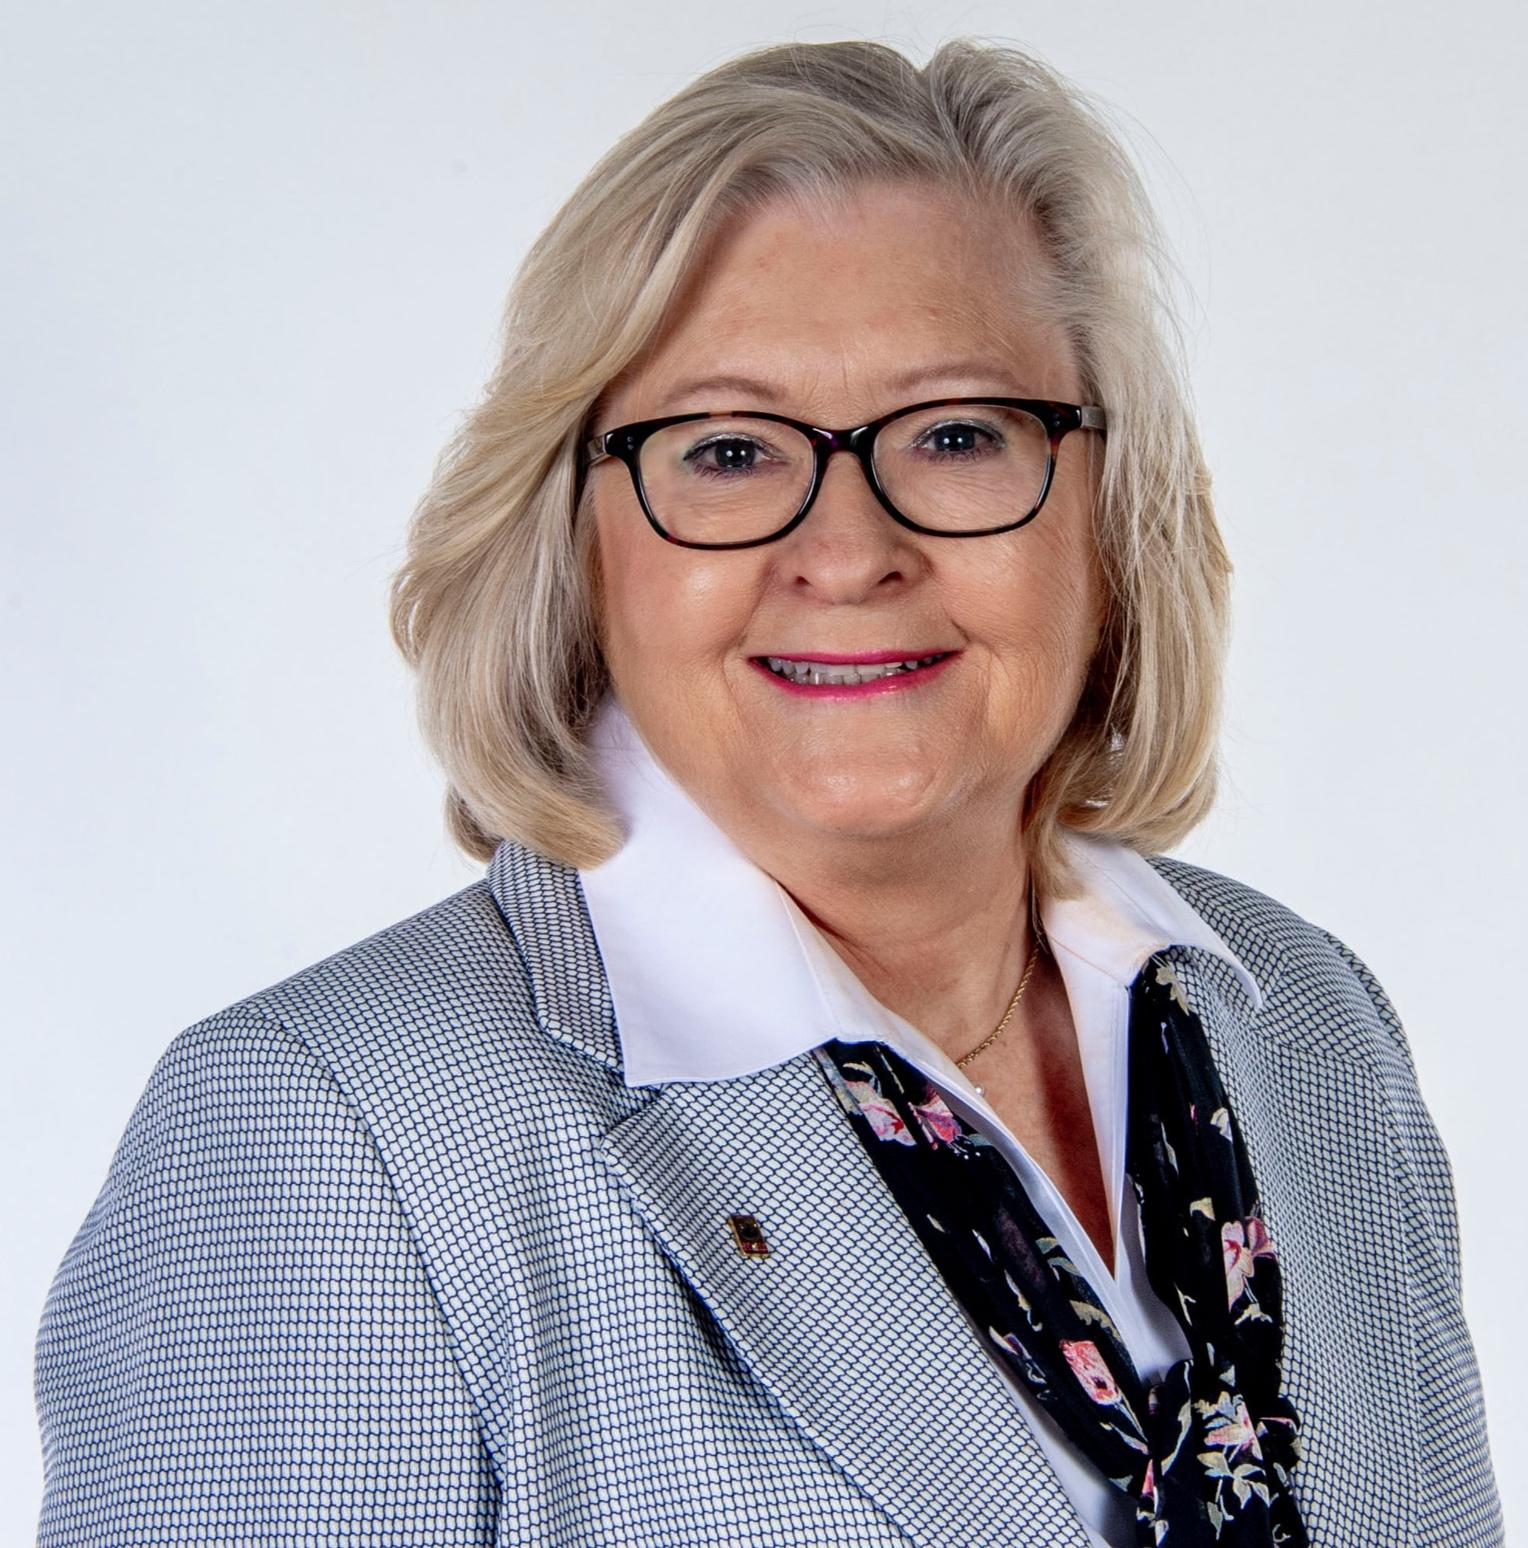 Jenny L. Grote, PE, PTOE, PTP   Founder & Principal of GroTrans Engineering, LLC